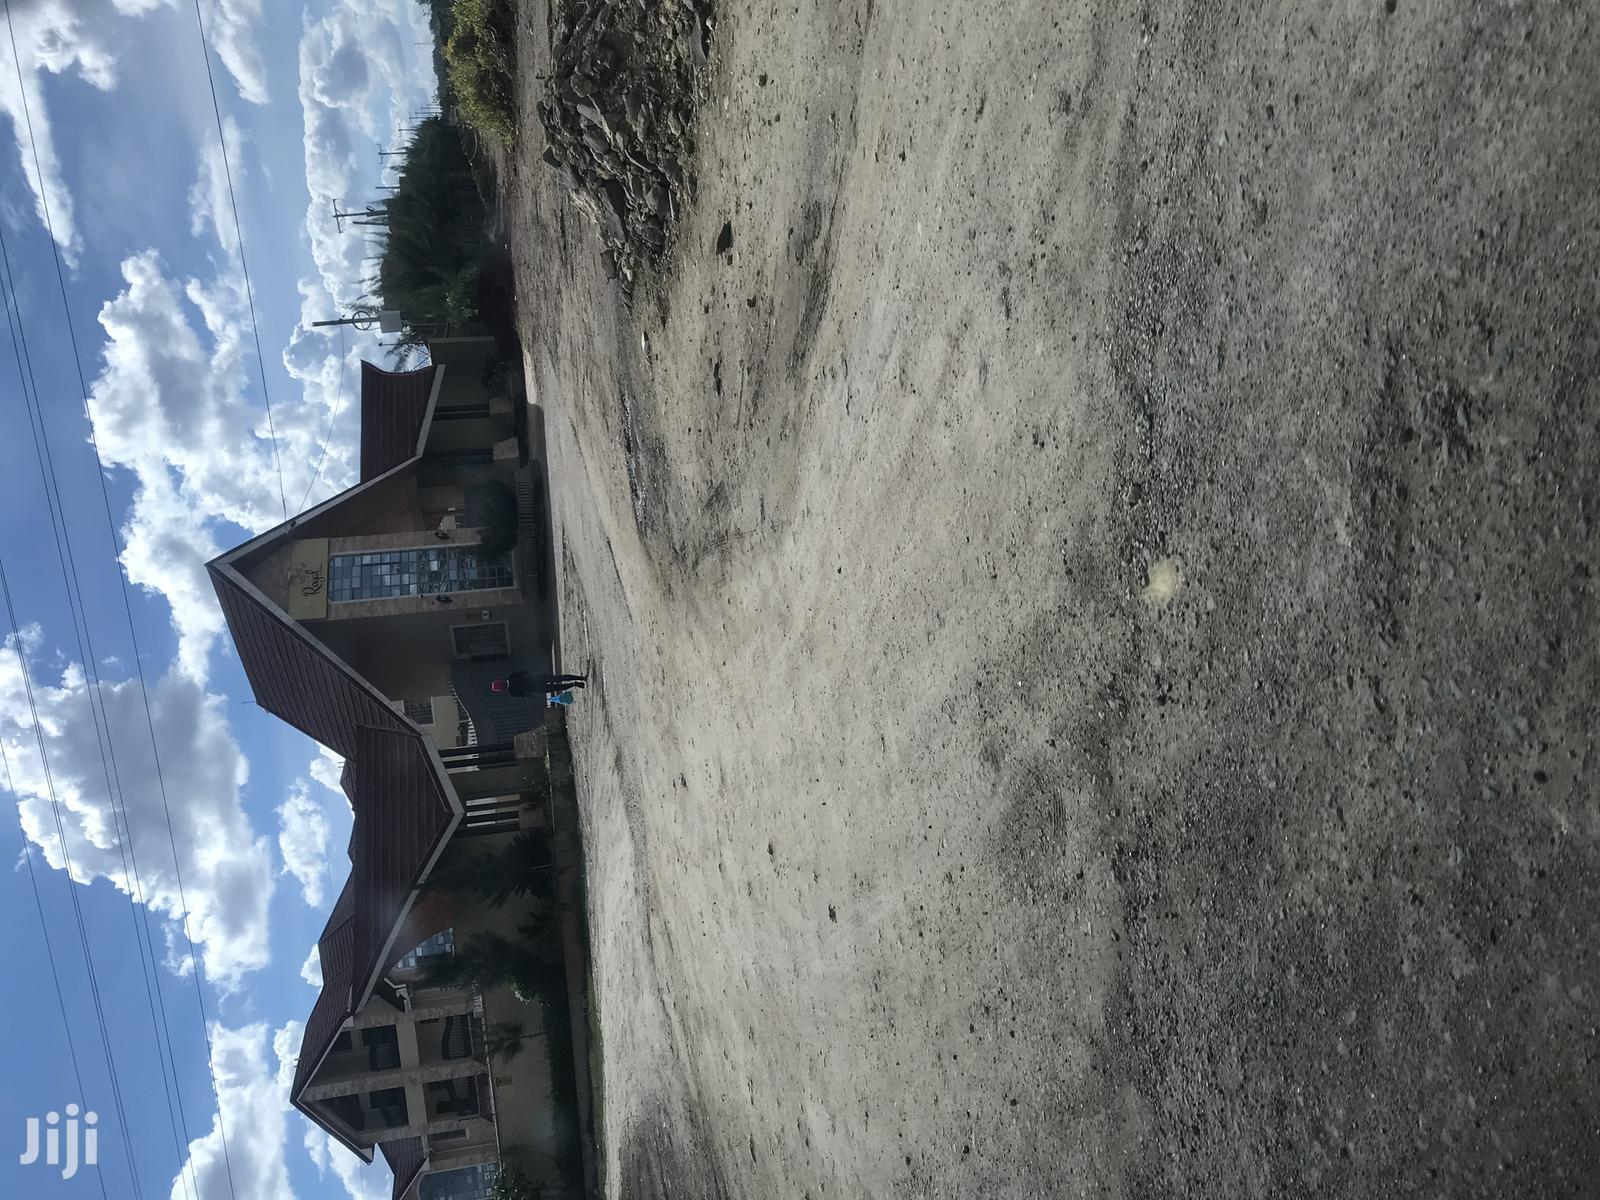 5acres on Tarmac Kitengela | Land & Plots For Sale for sale in Kaputiei North, Kajiado, Kenya